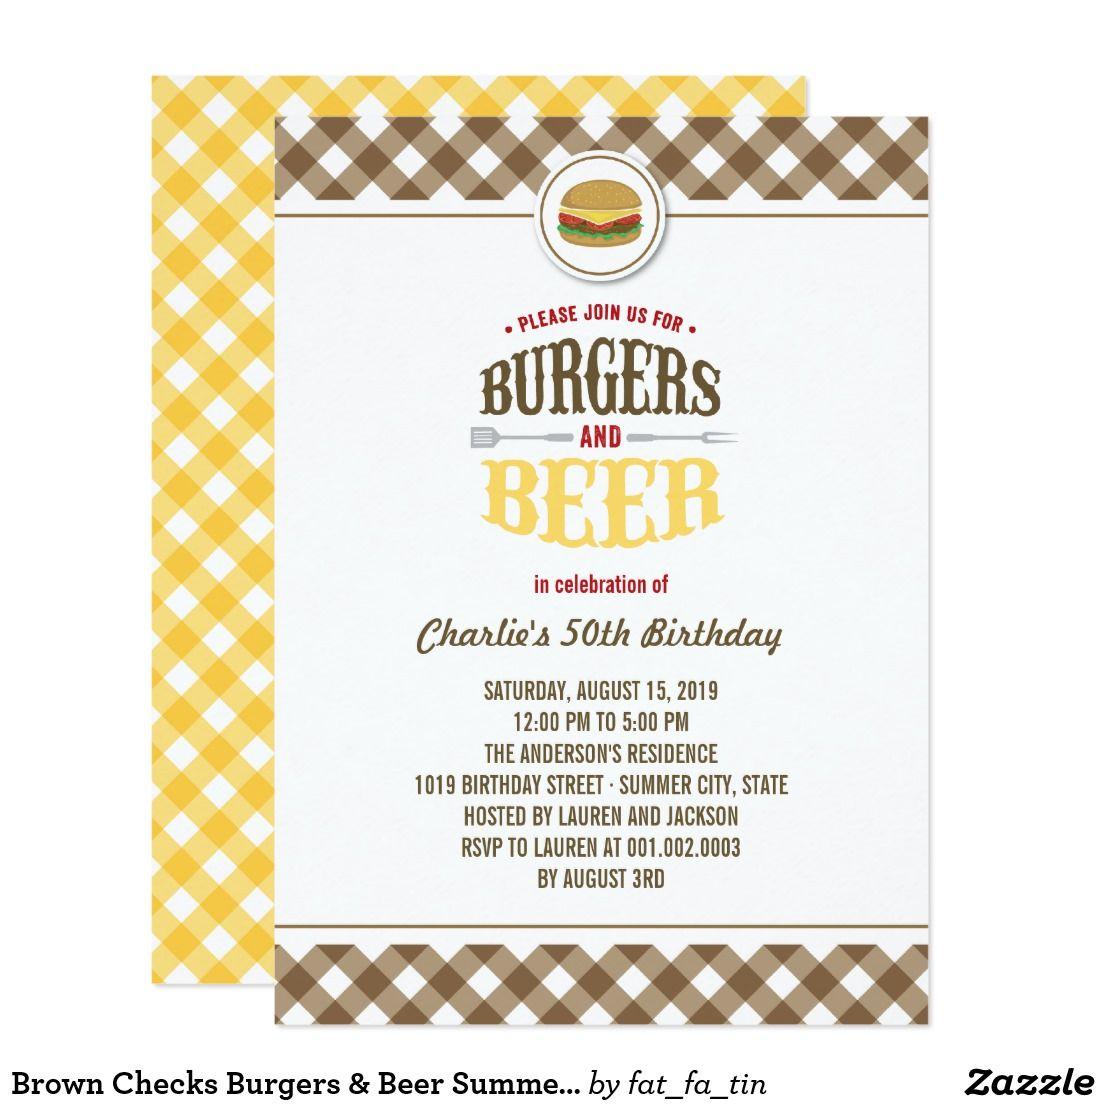 Brown Checks Burgers & Beer Summer Birthday Party Invitation ...